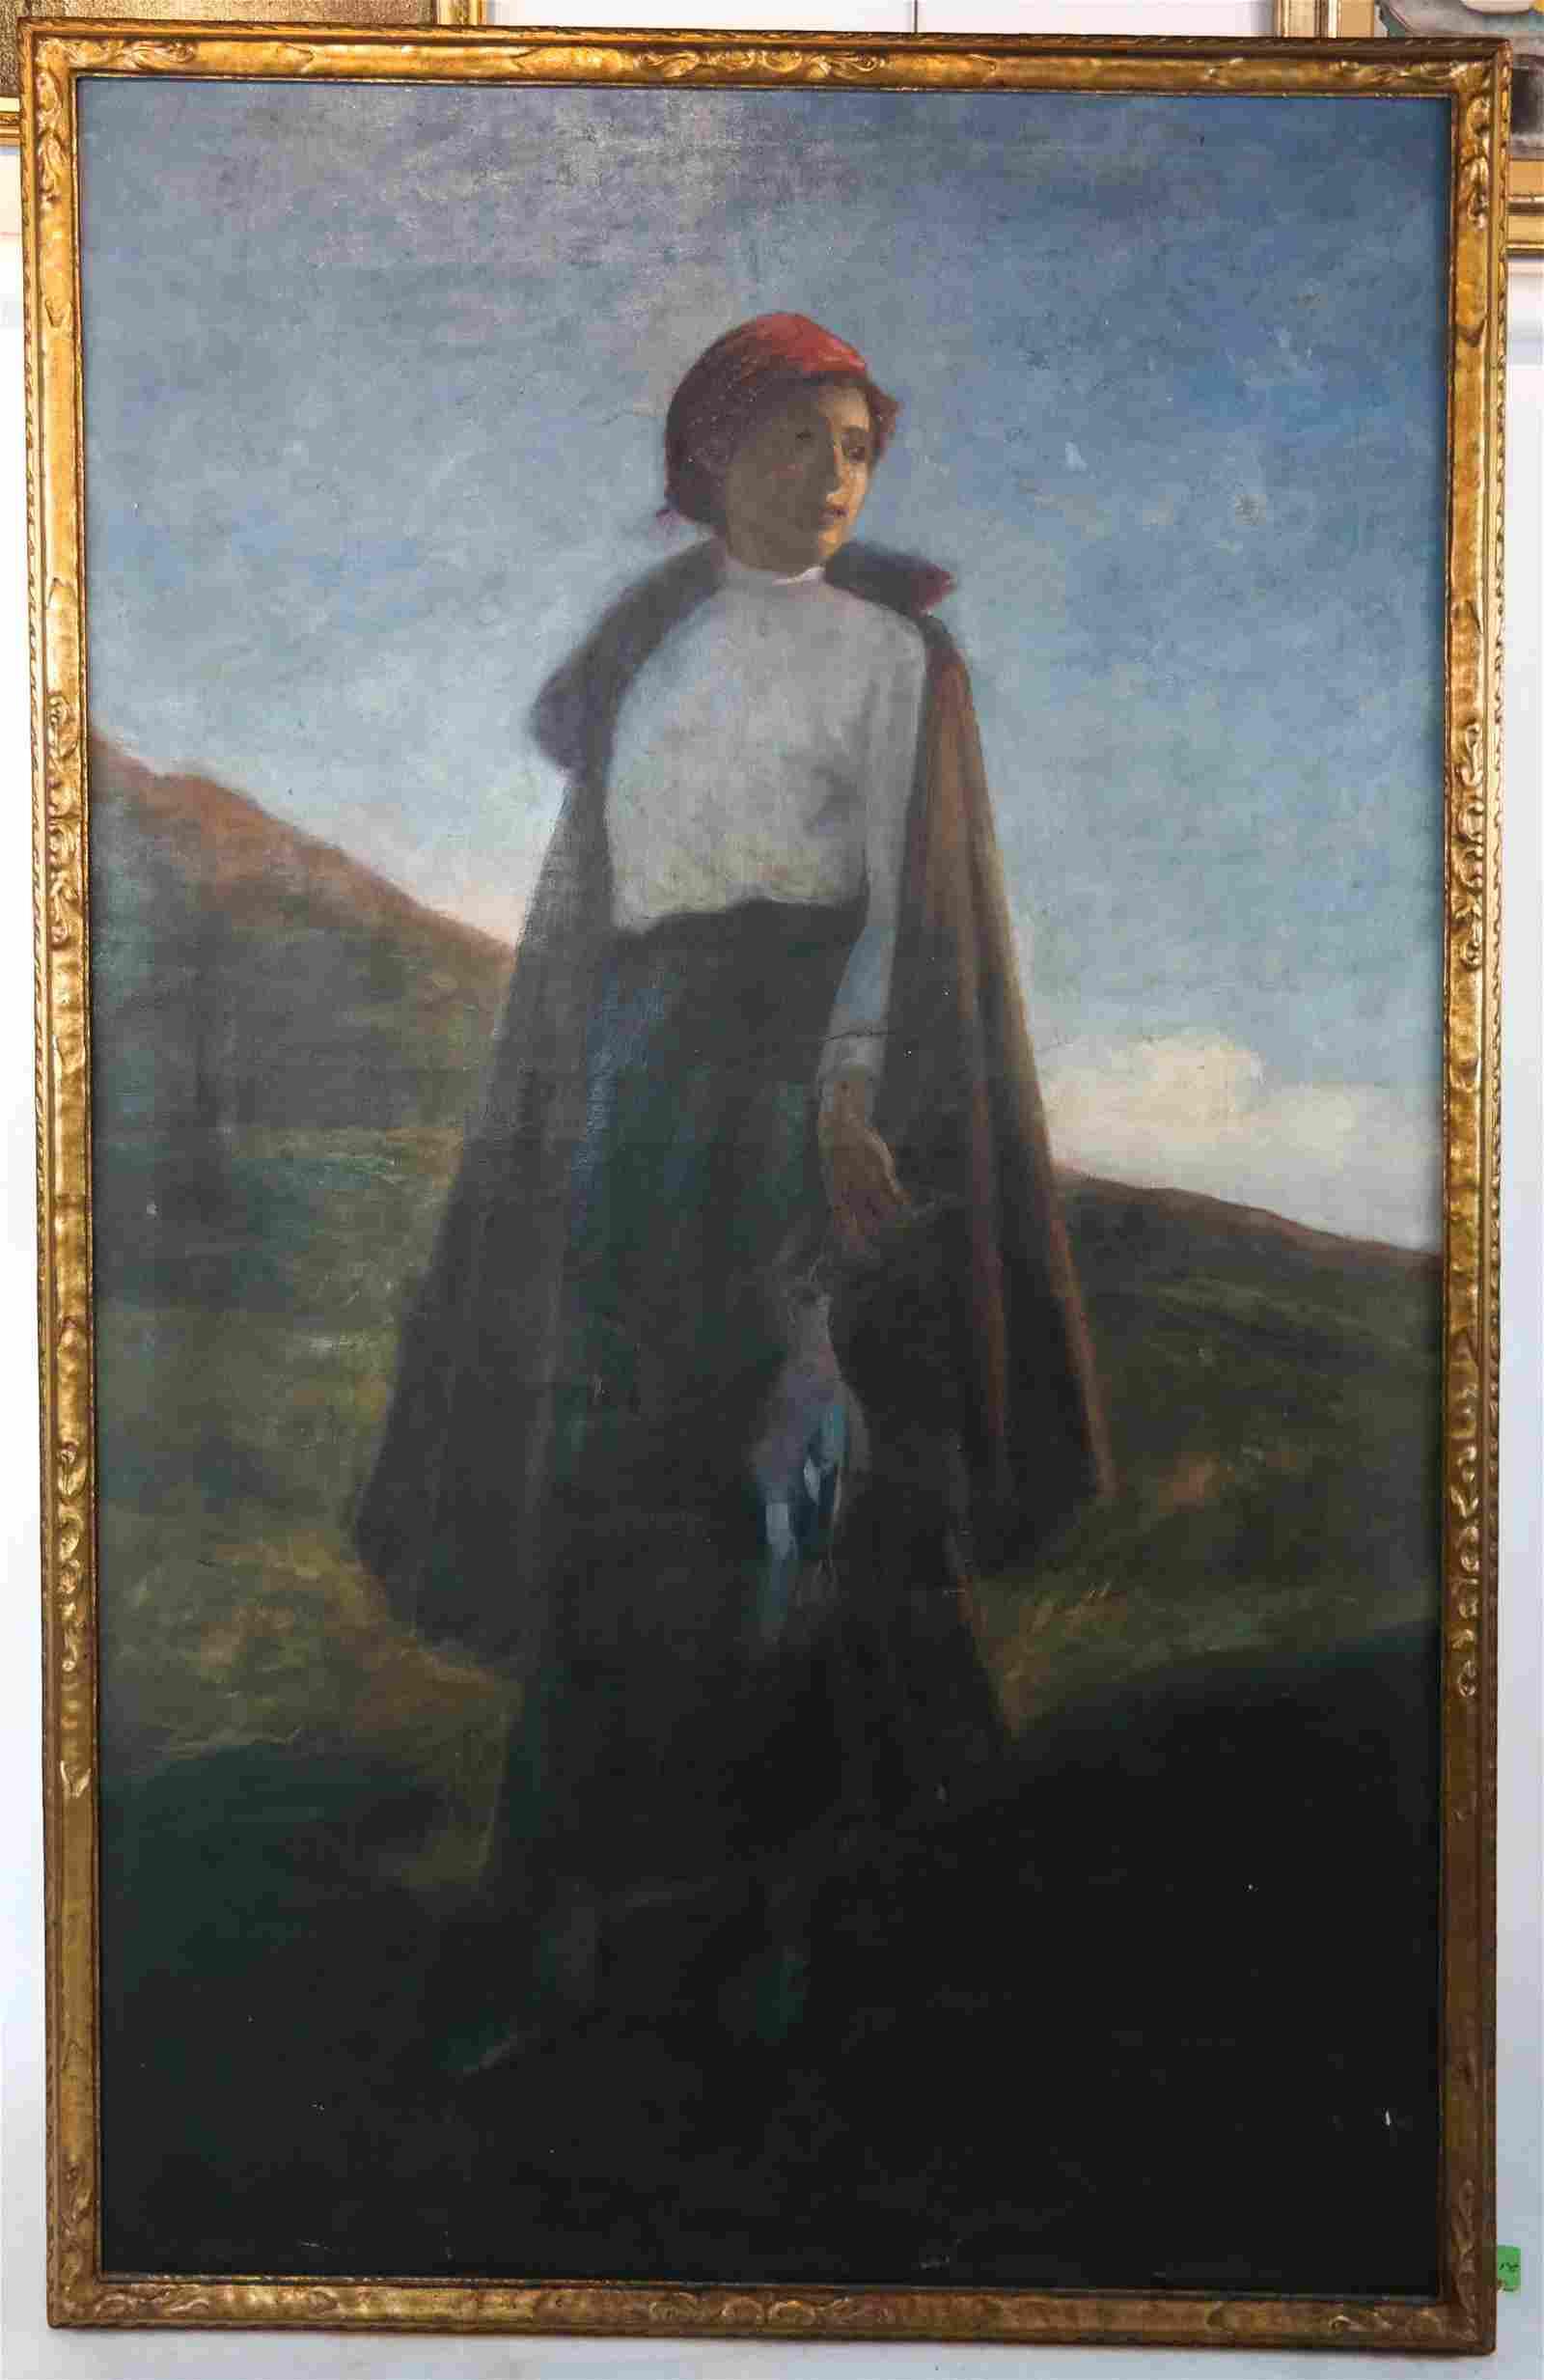 19th C. Continental School - Peasant Woman - O/C